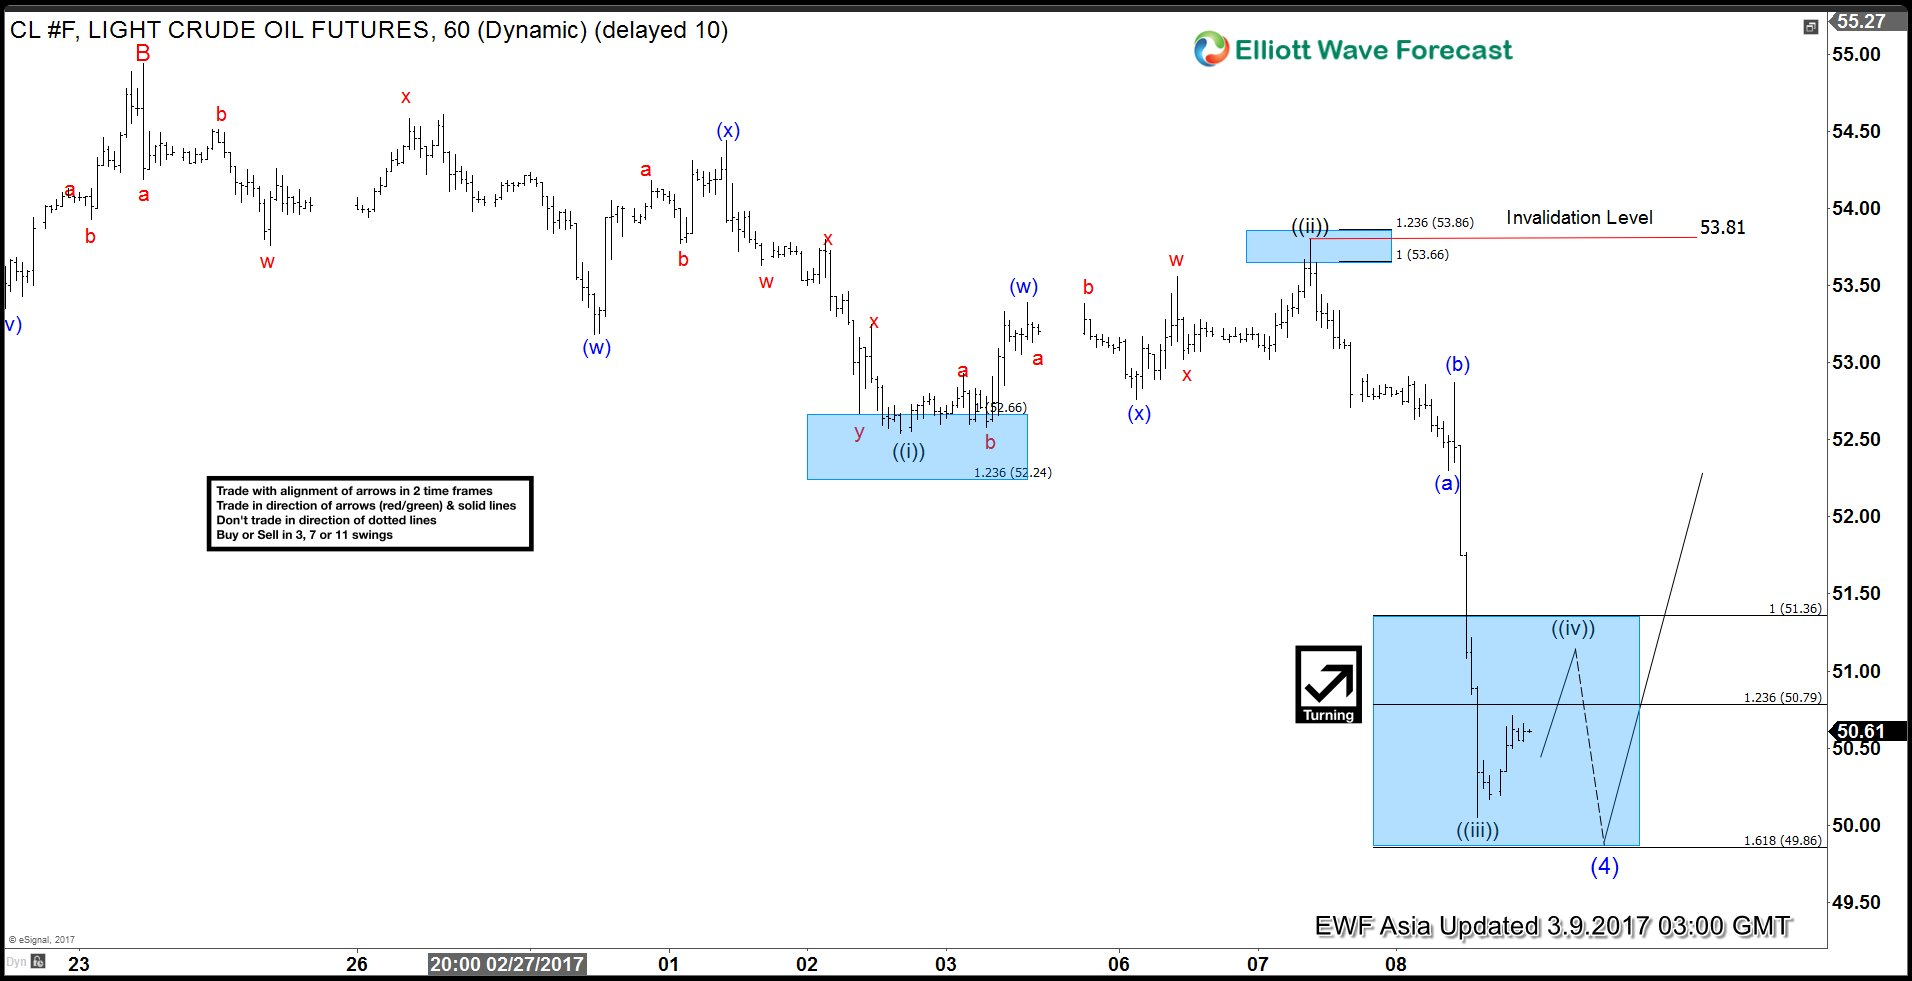 CL_F Elliott Wave View: Ending a Flat Correction